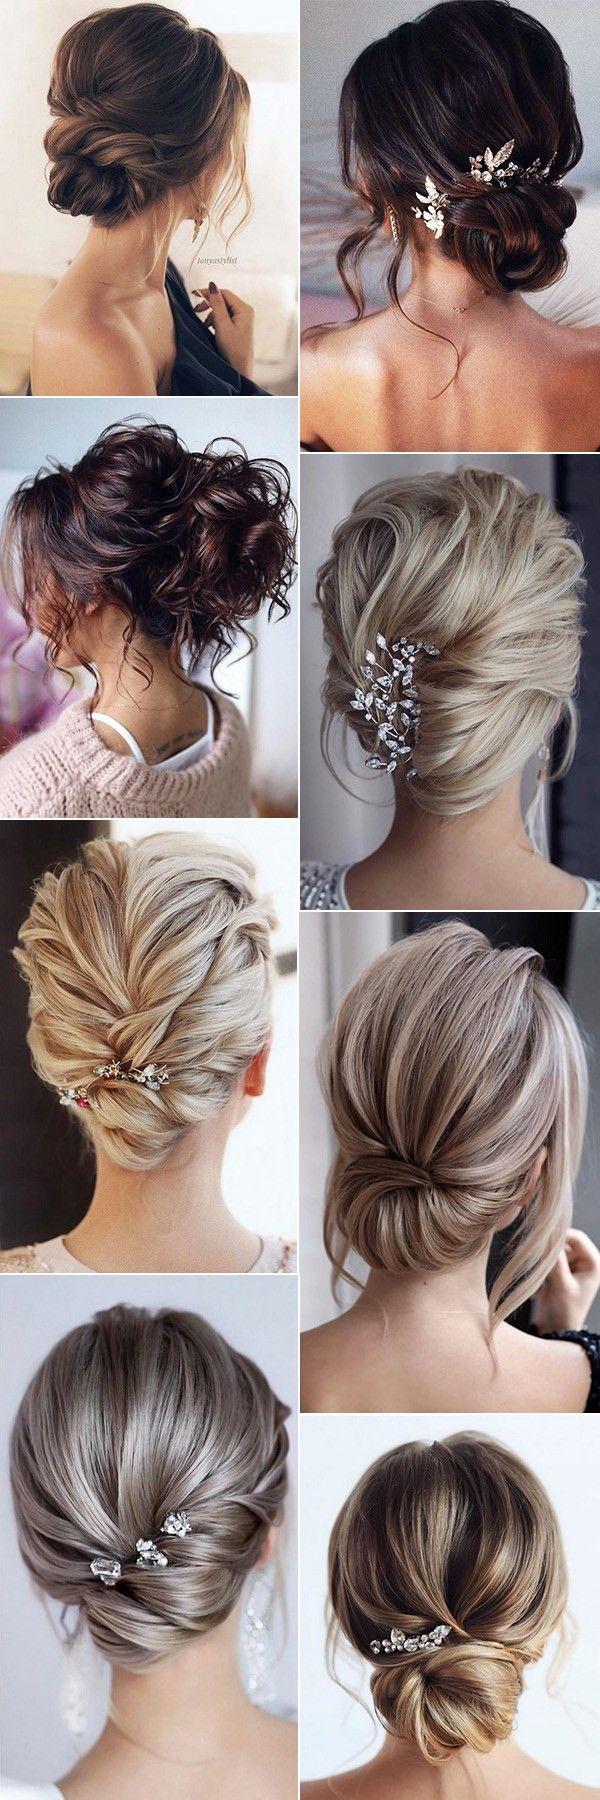 11 Medium Length Wedding Hairstyles for 1121 Brides